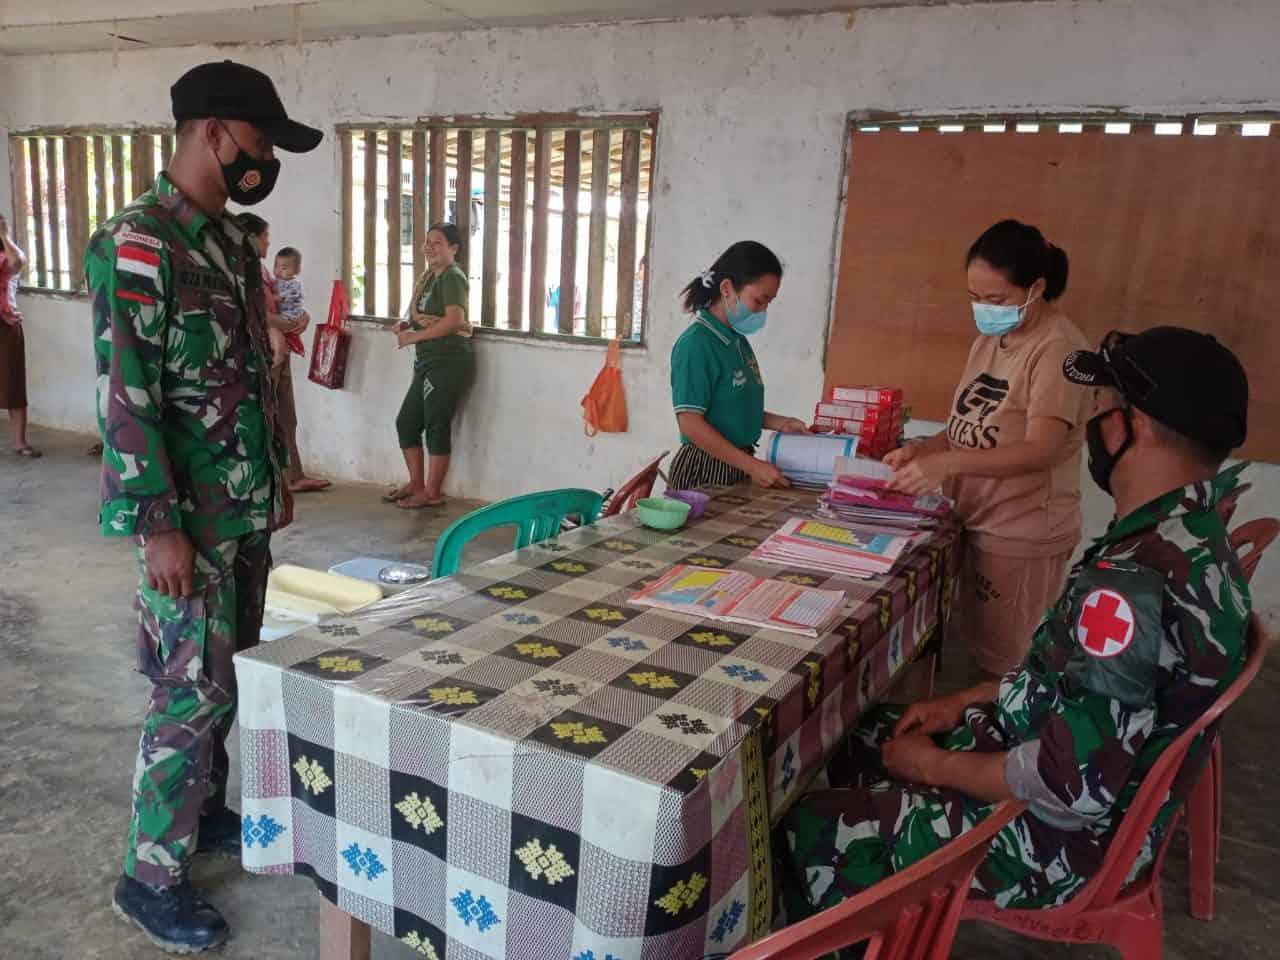 Bersama Tenaga Medis Puskesmas Anggota Satgas Yonif 144/JY Gelar Posyandu di Perbatasan